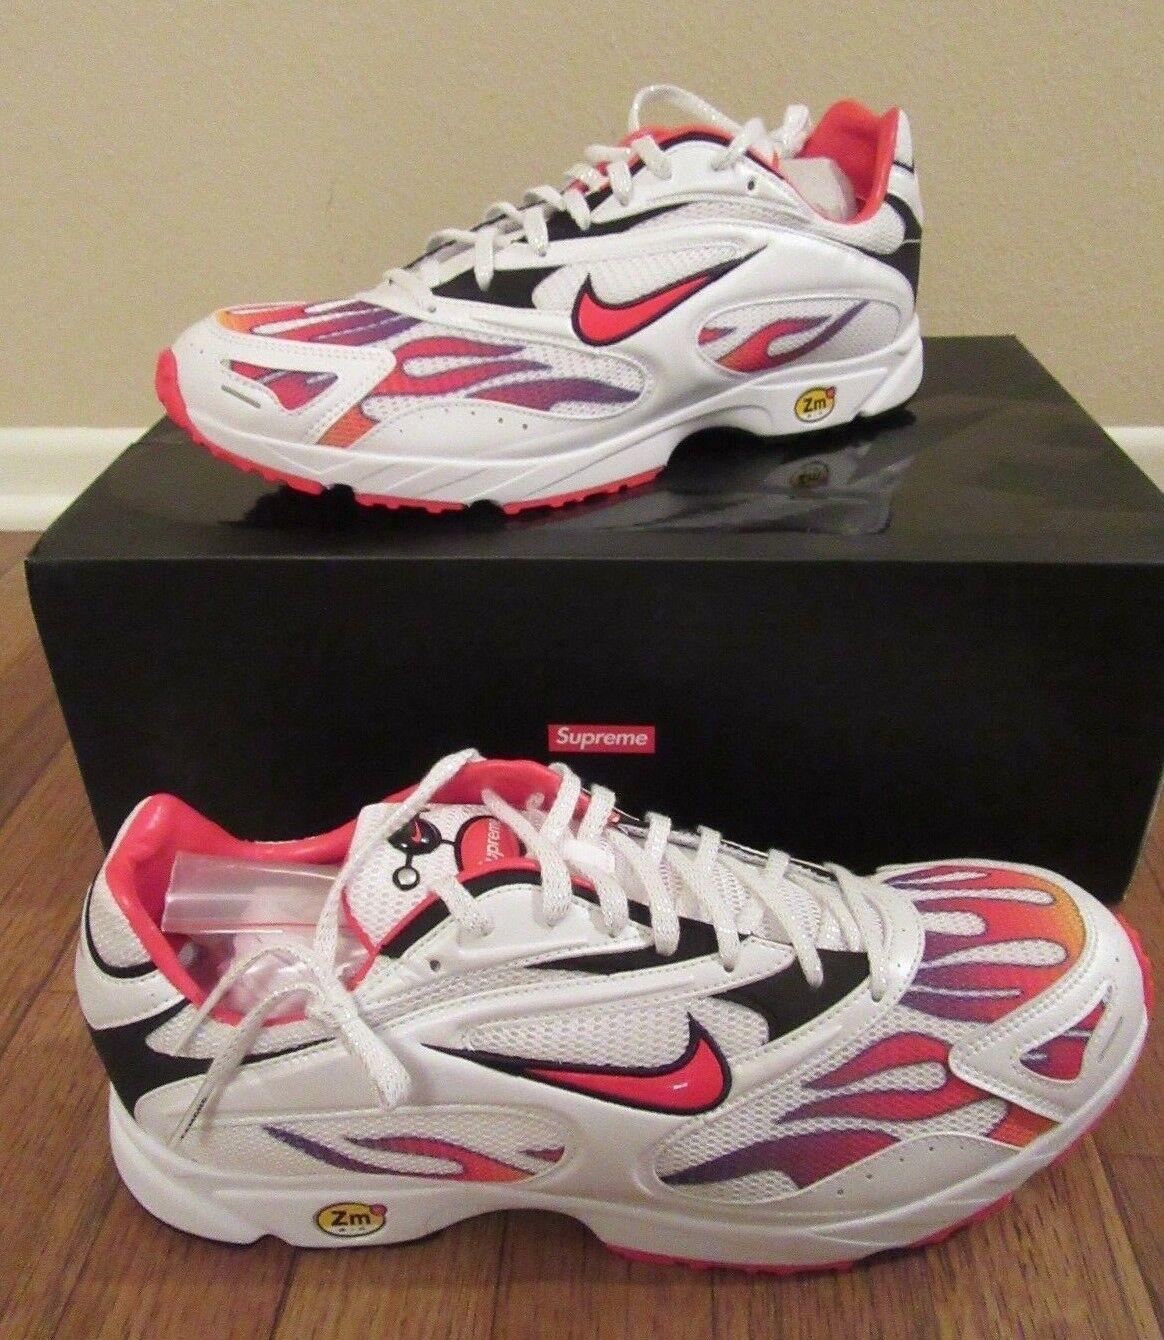 Supreme Nike Air Streak Spectrum Plus Size 11.5 White Habanero Red AQ1279 100 DS